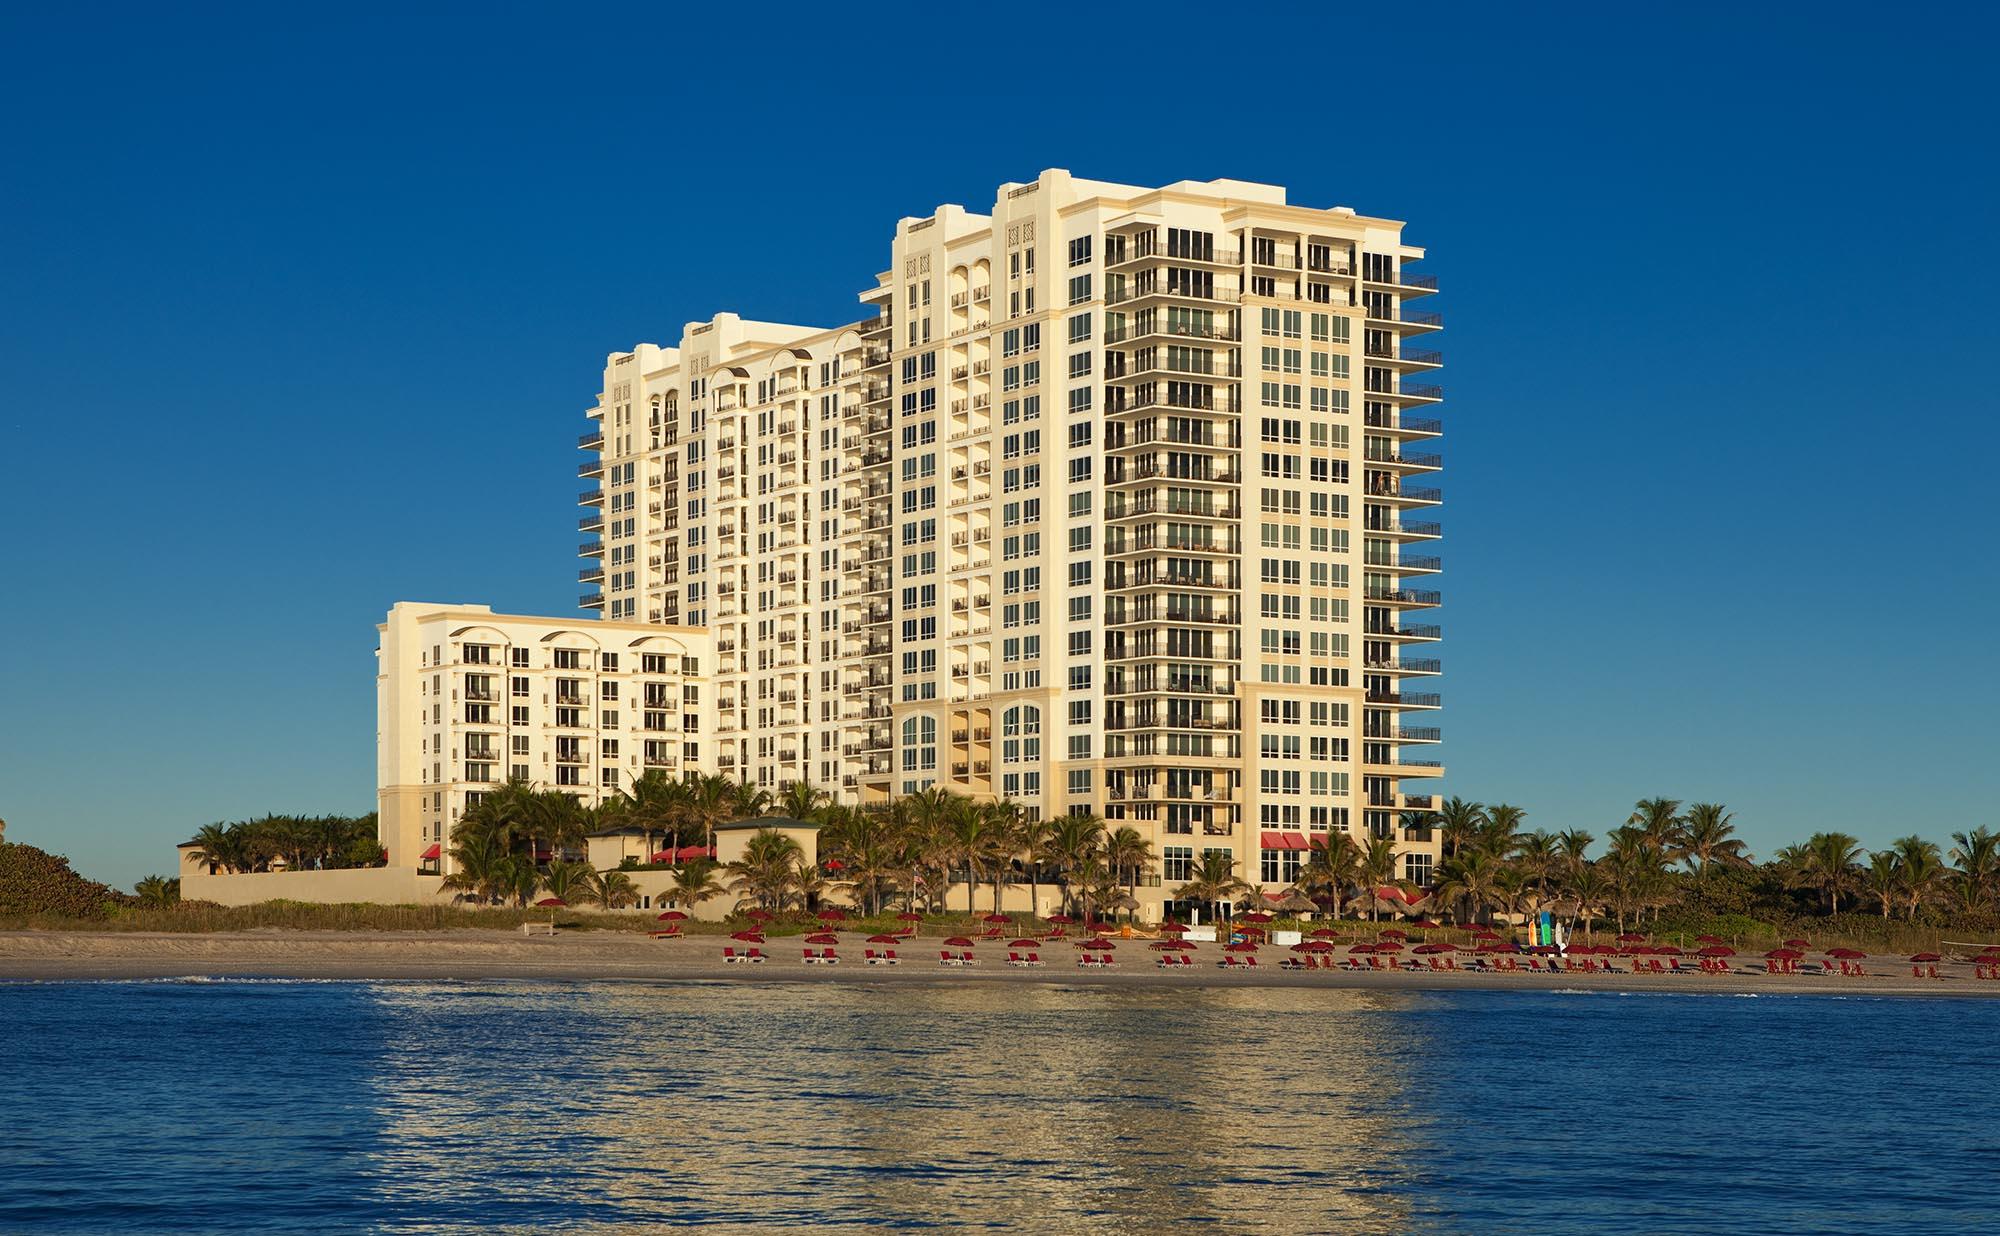 Palm Beach Marriott Singer Island Beach Resort & Spa - Urgo Hotels - Singer Island Florida Map